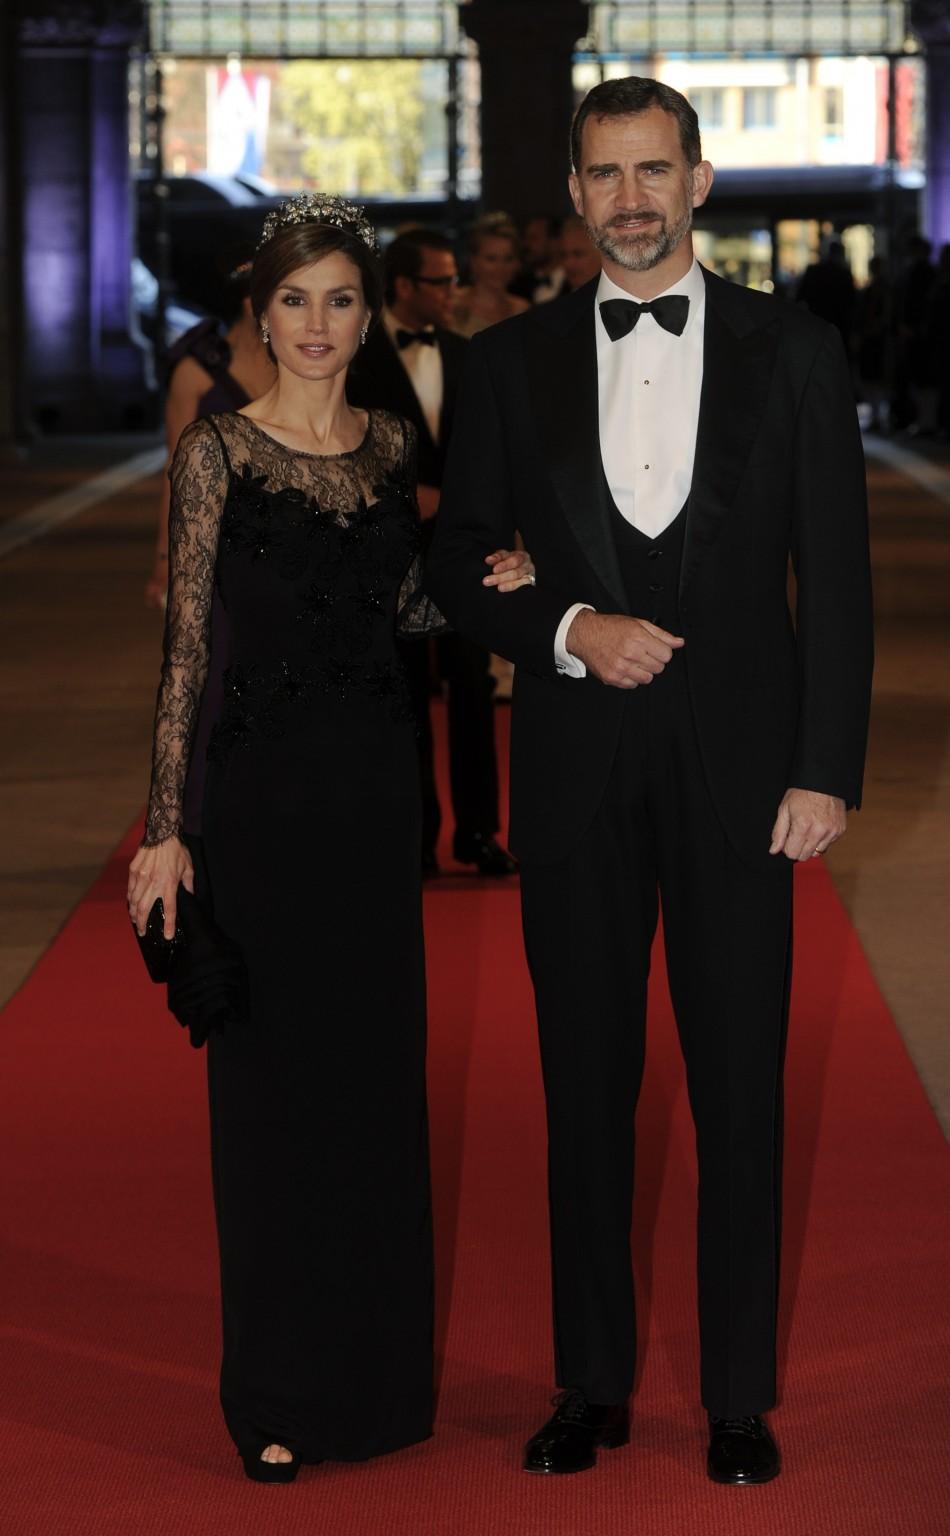 Spanish Princess Letizia and Her Husband Crown Prince Felipe